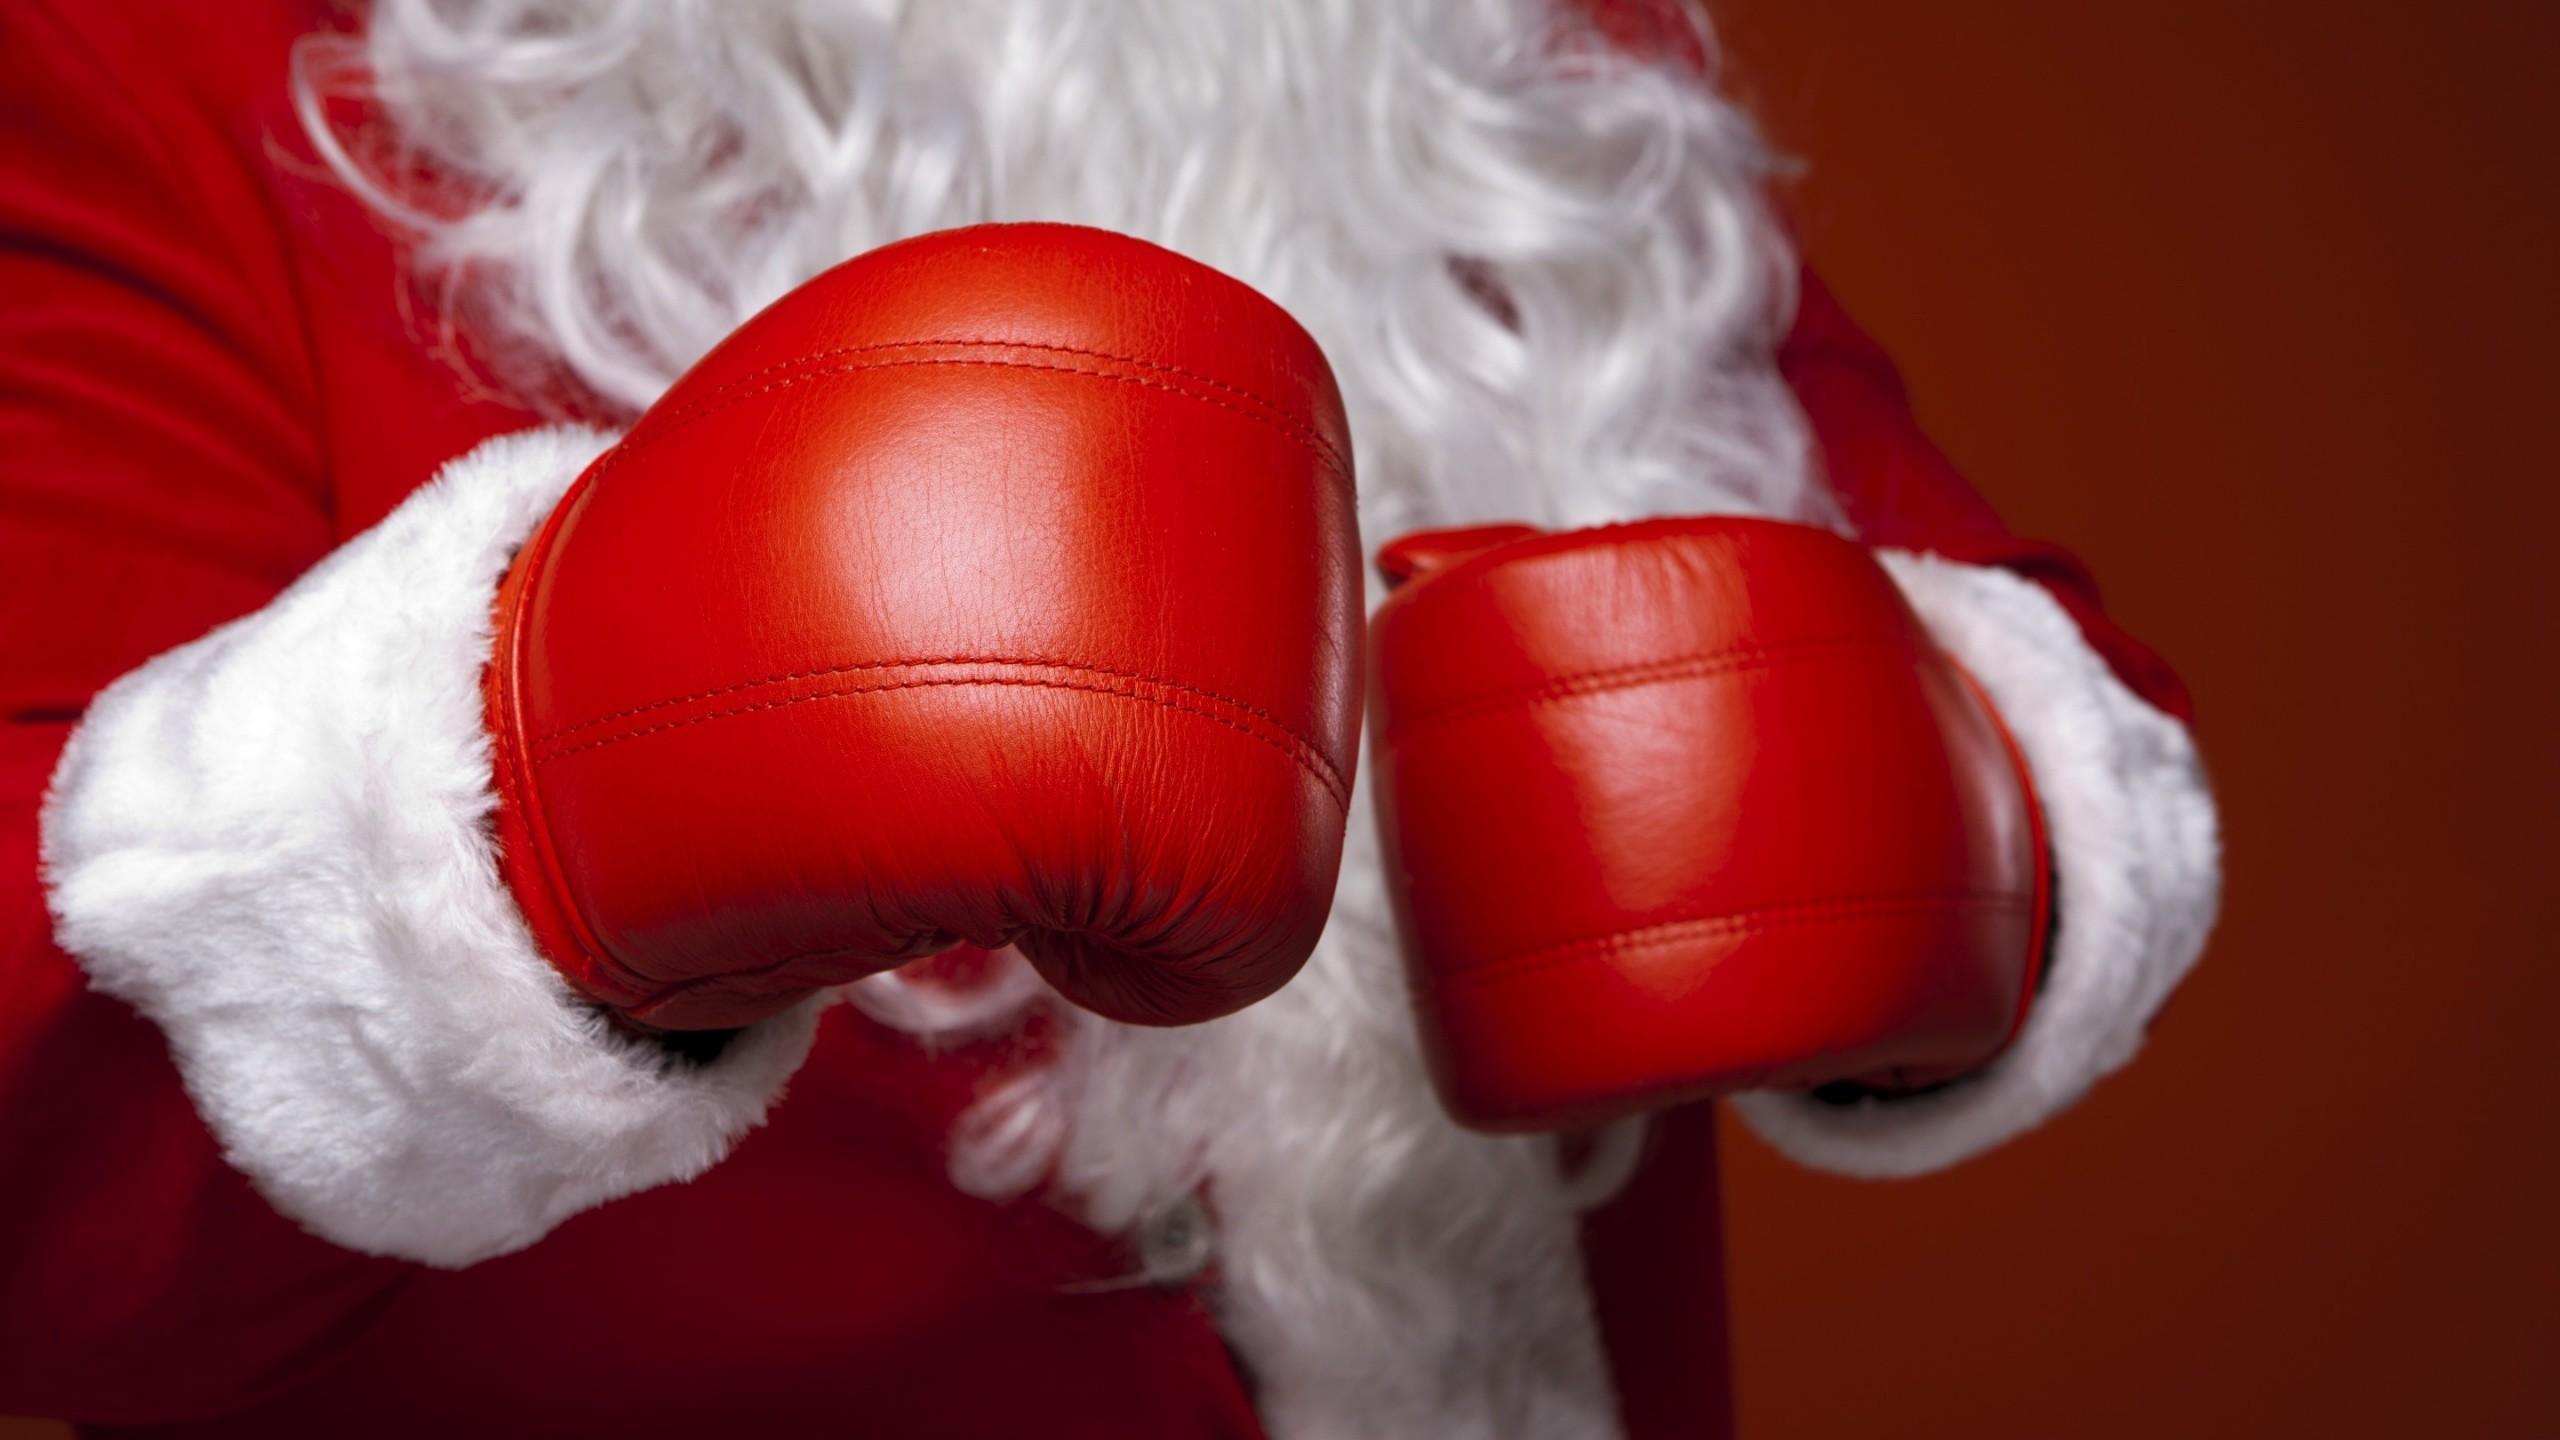 Res: 2560x1440, Christmas Santa Claus Boxing Glove | 2560 x 1440 ...